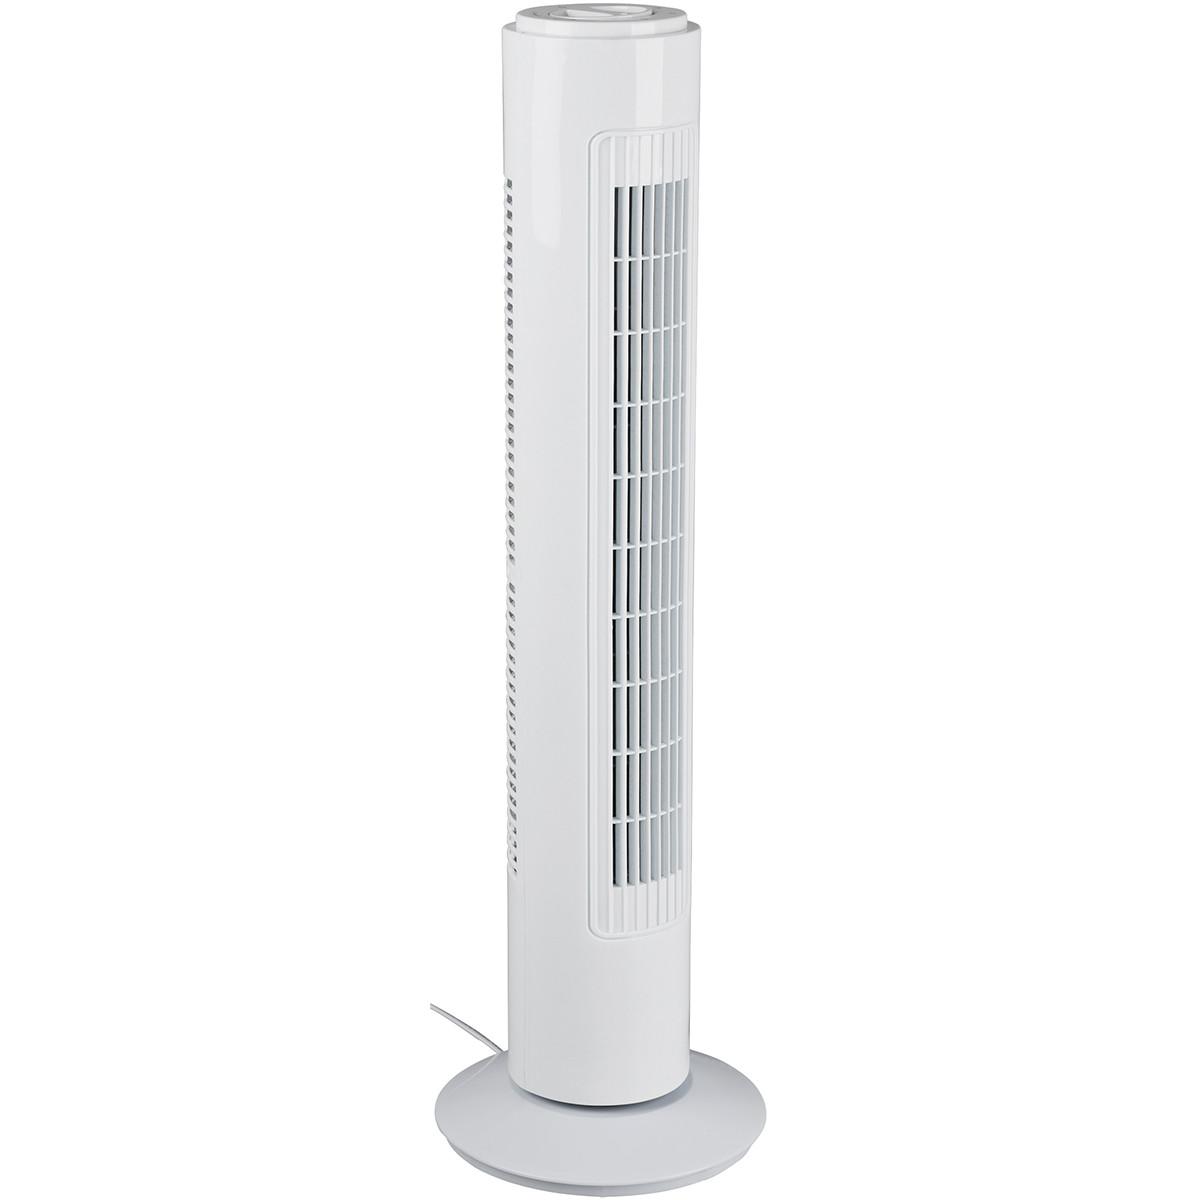 Ventilator - Trion Malon - Torenventilator - Staand - Rond - Mat Wit - Kunststof